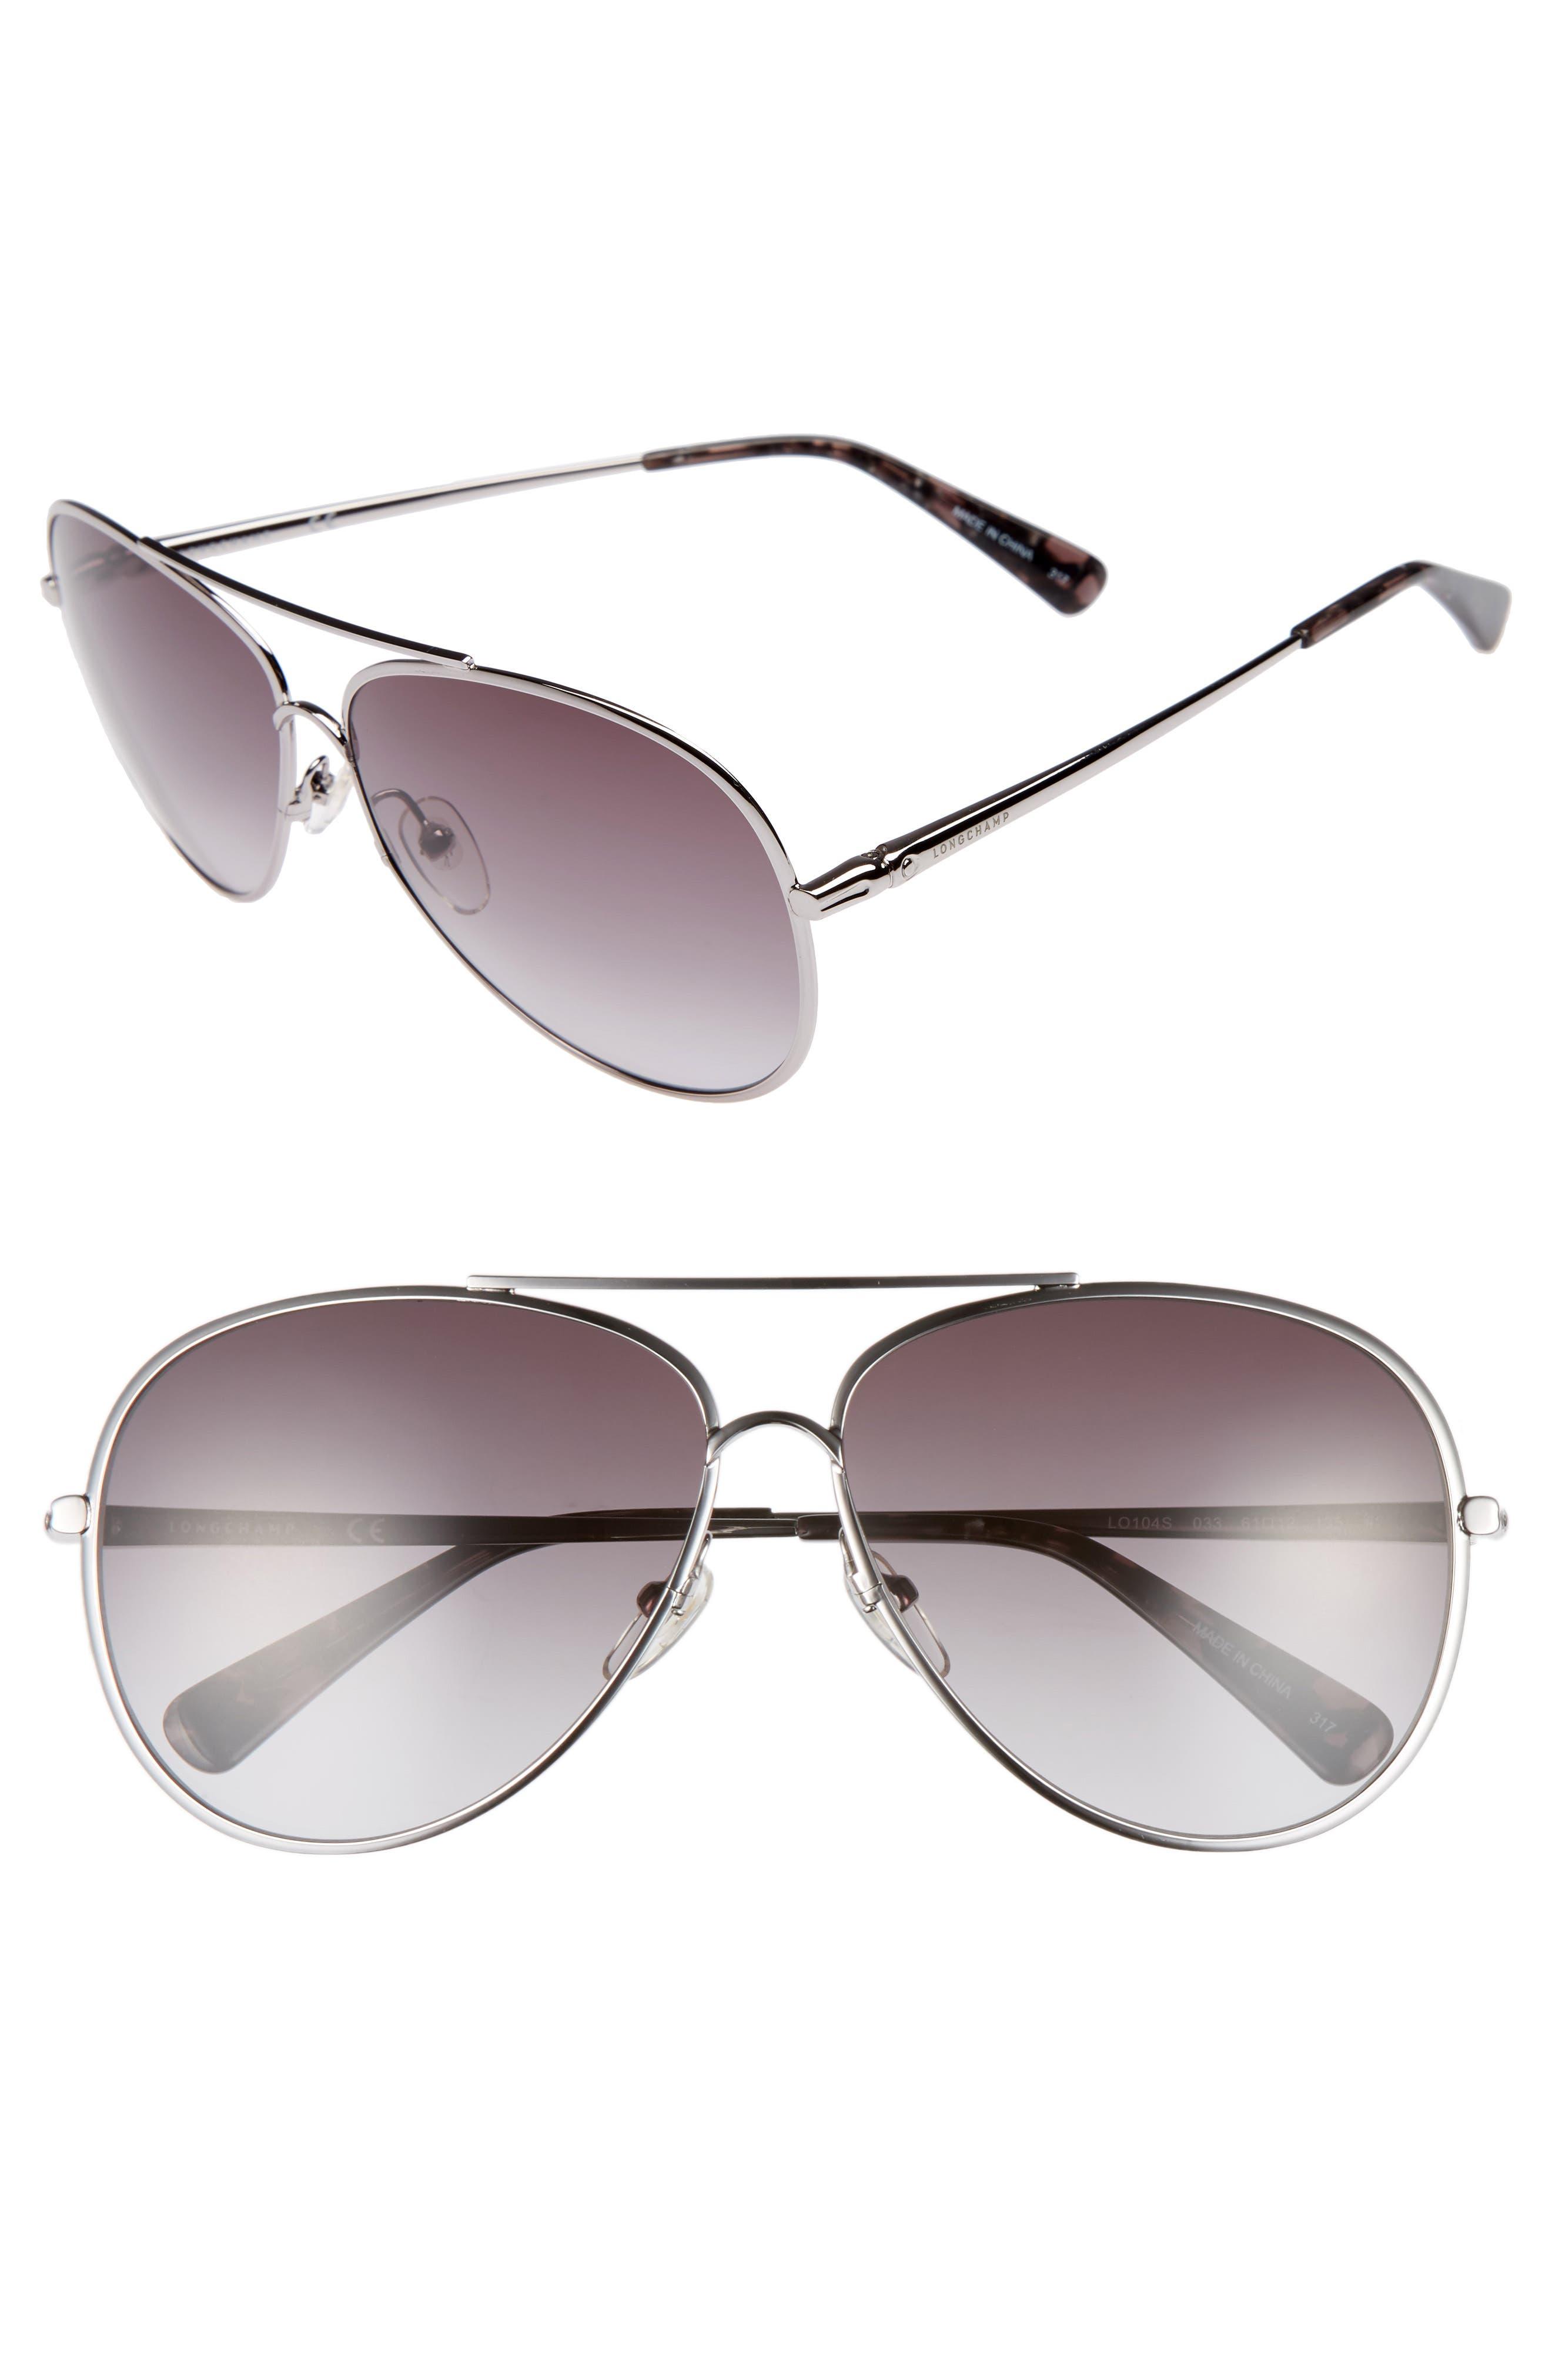 61mm Gradient Lens Aviator Sunglasses,                         Main,                         color, 033